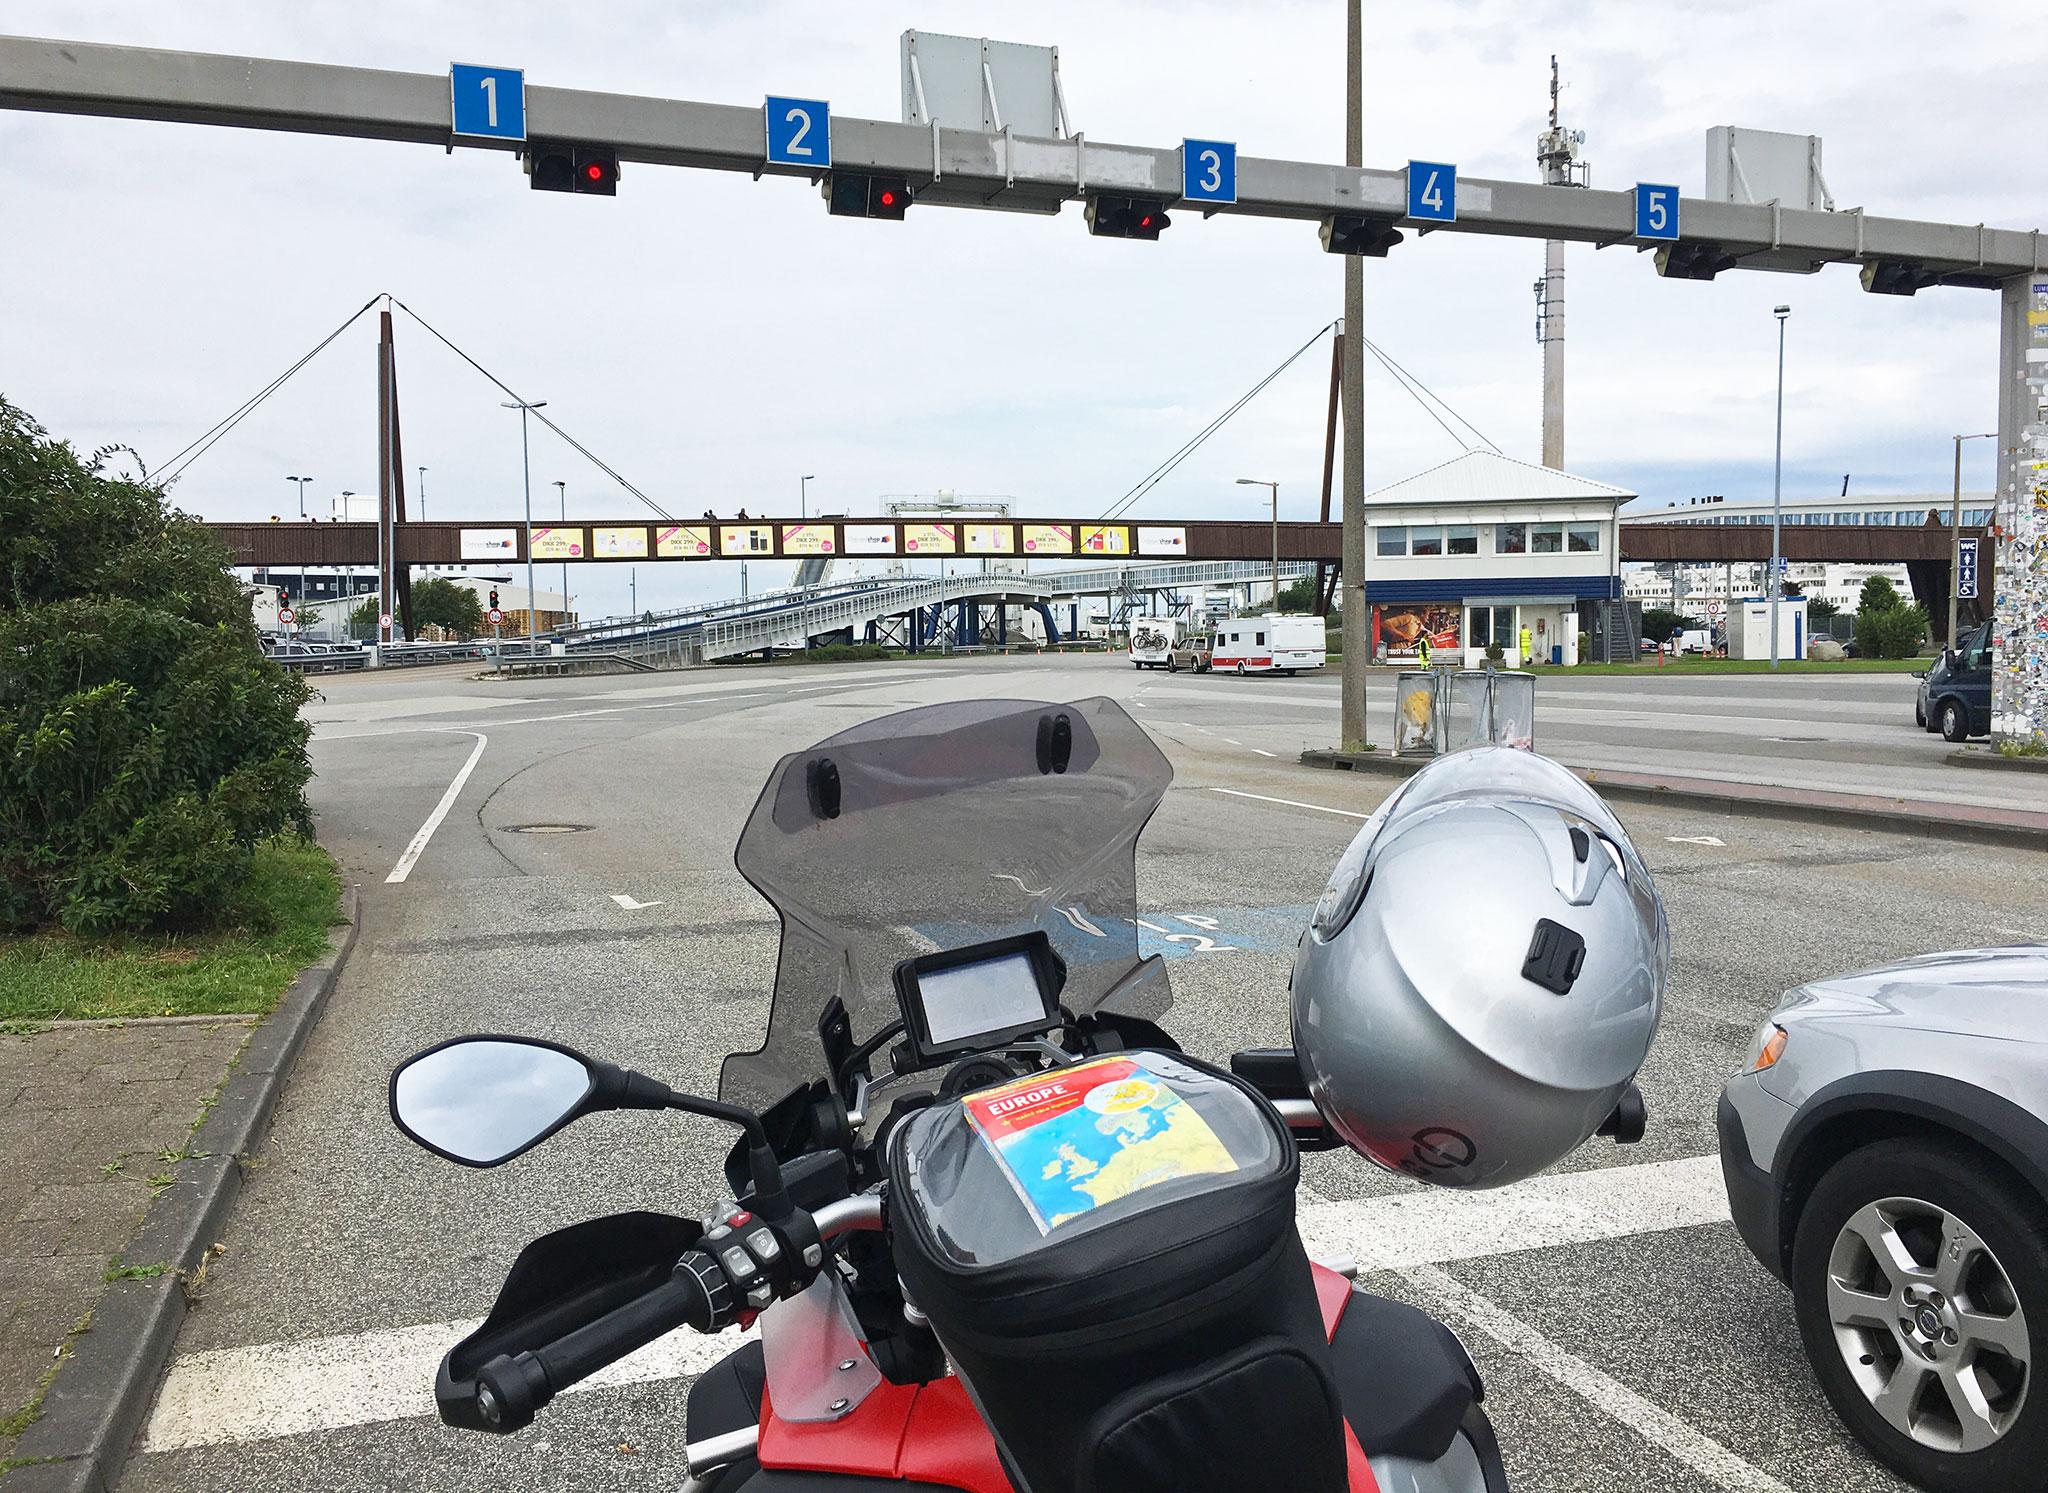 Waiting at Puttgarten Fehman heading north, the only motorbike rider on that trip